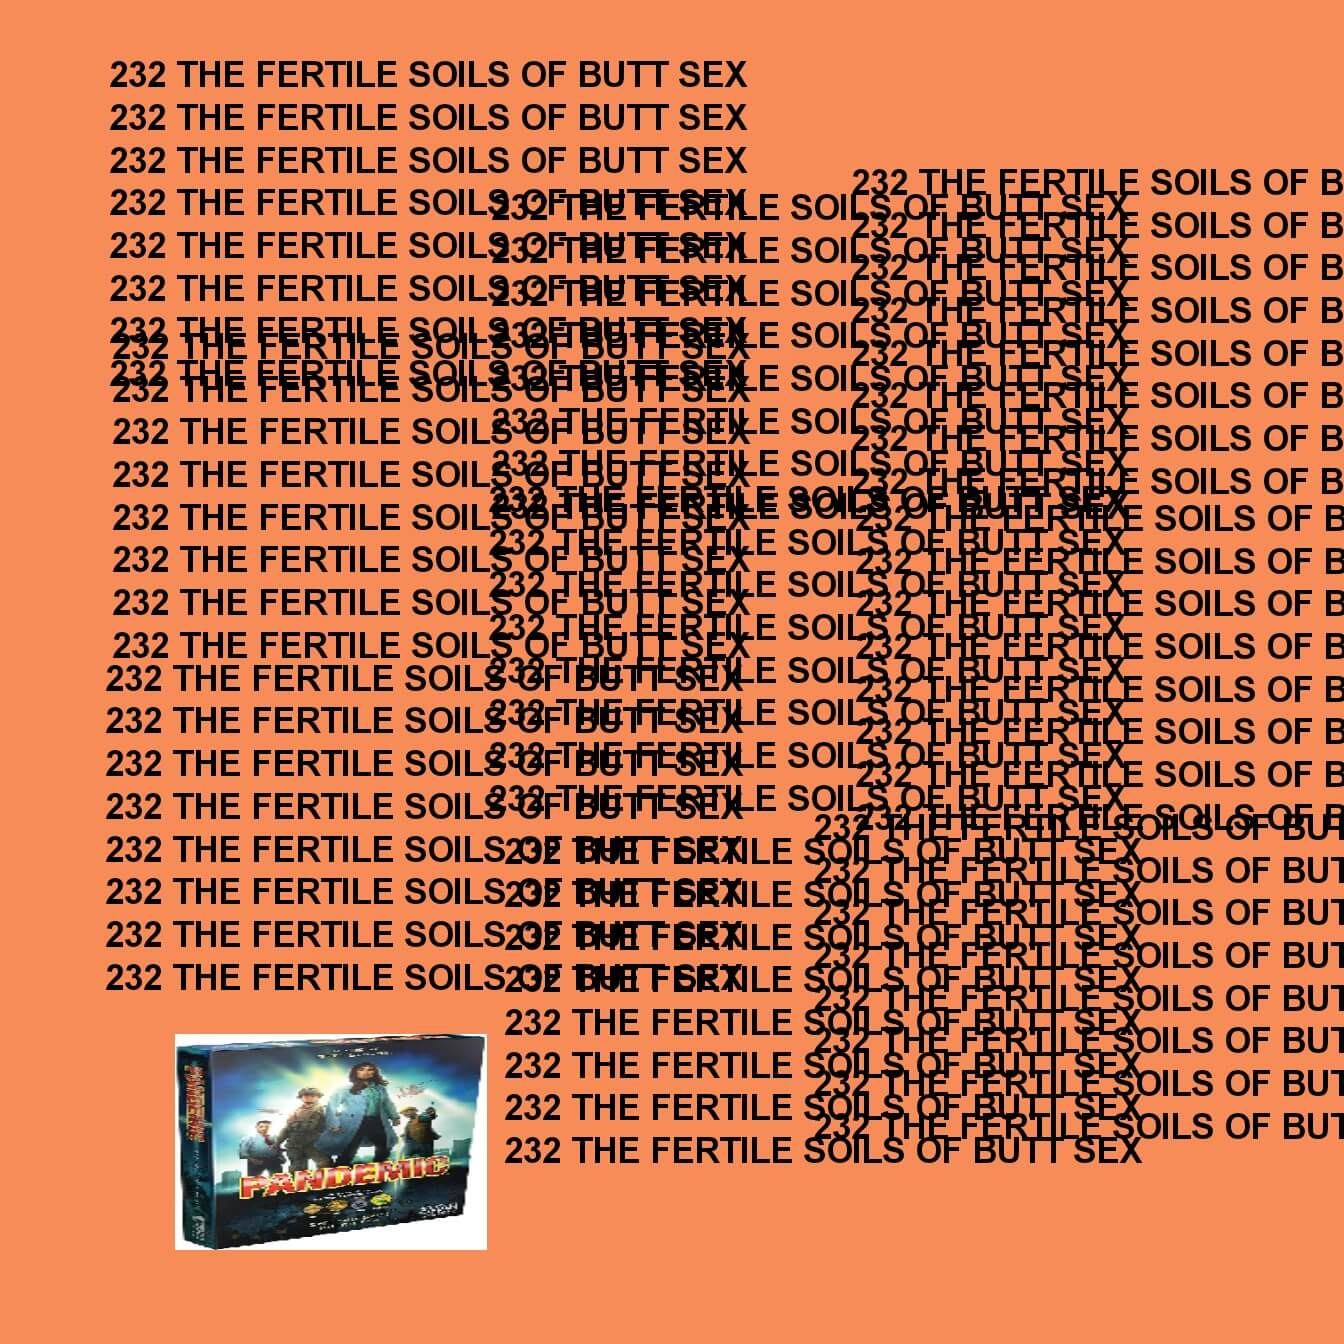 GTST Episode 232: The Fertile Soils of Buttsex